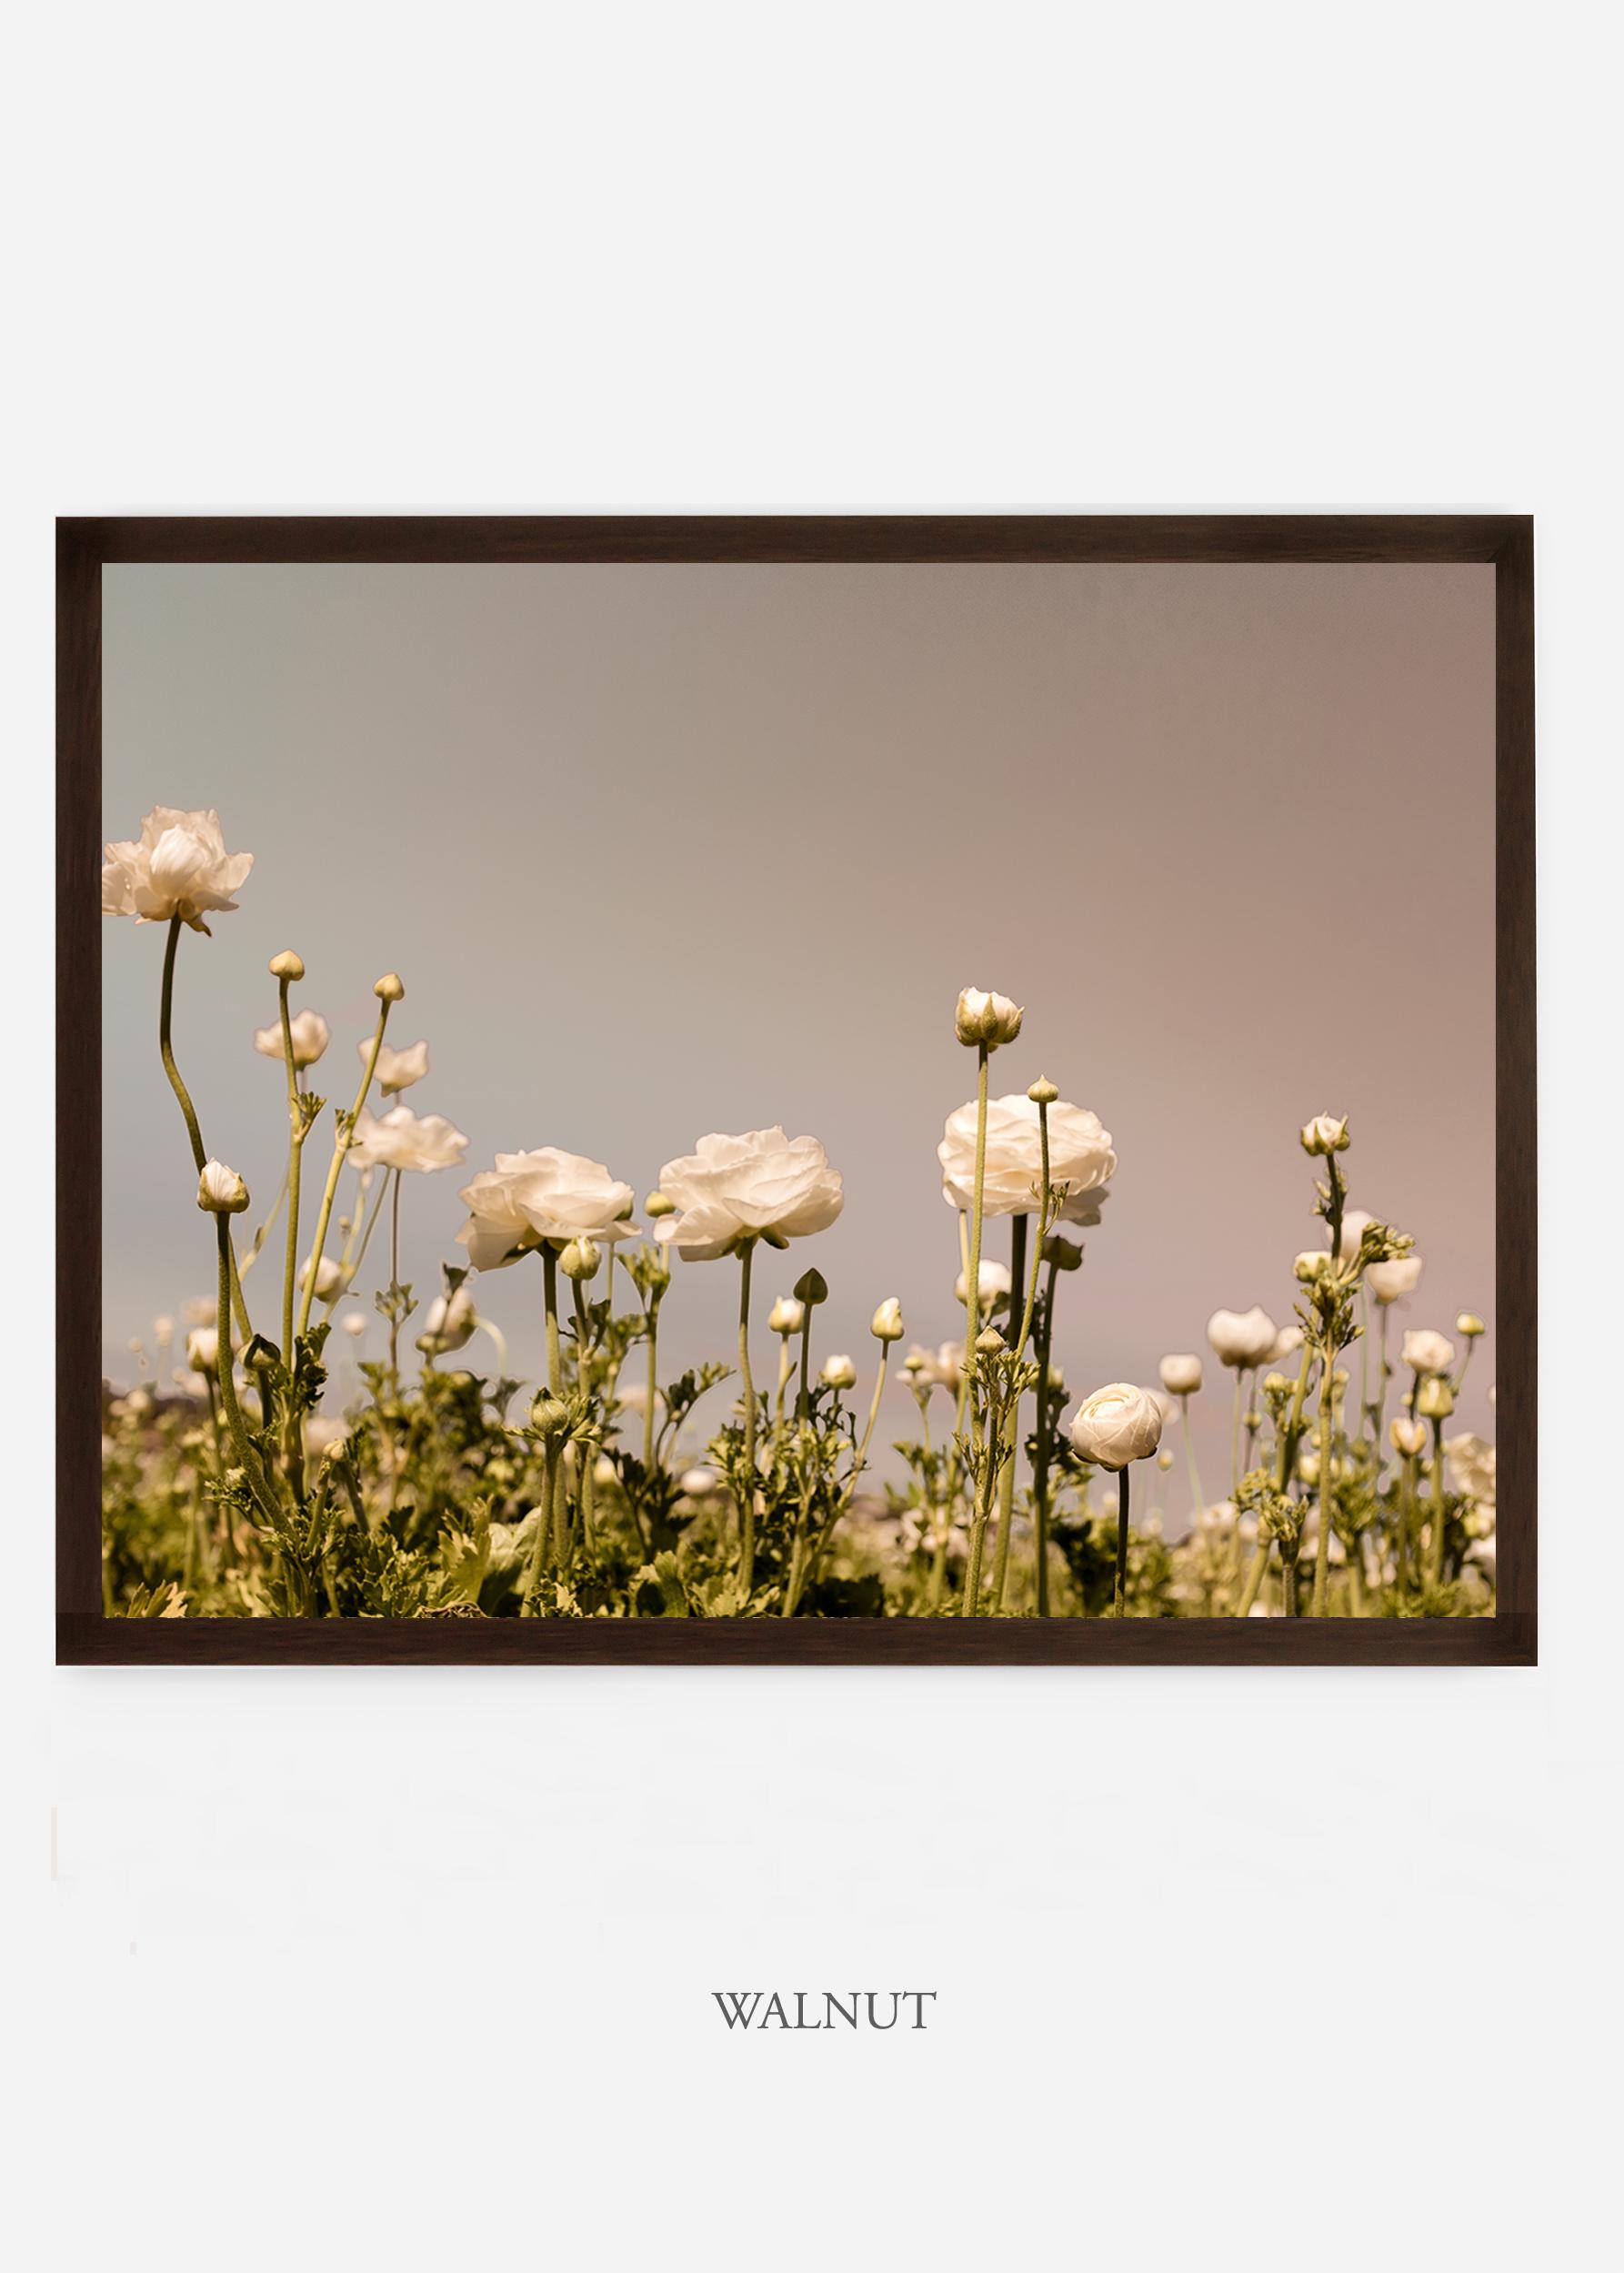 NoMat-Walnut-Frame-flora-6-Wilder-California-Art-Floral-Home-decor-Prints-Dahlia-Botanical-Artwork-Interior-design.jpg